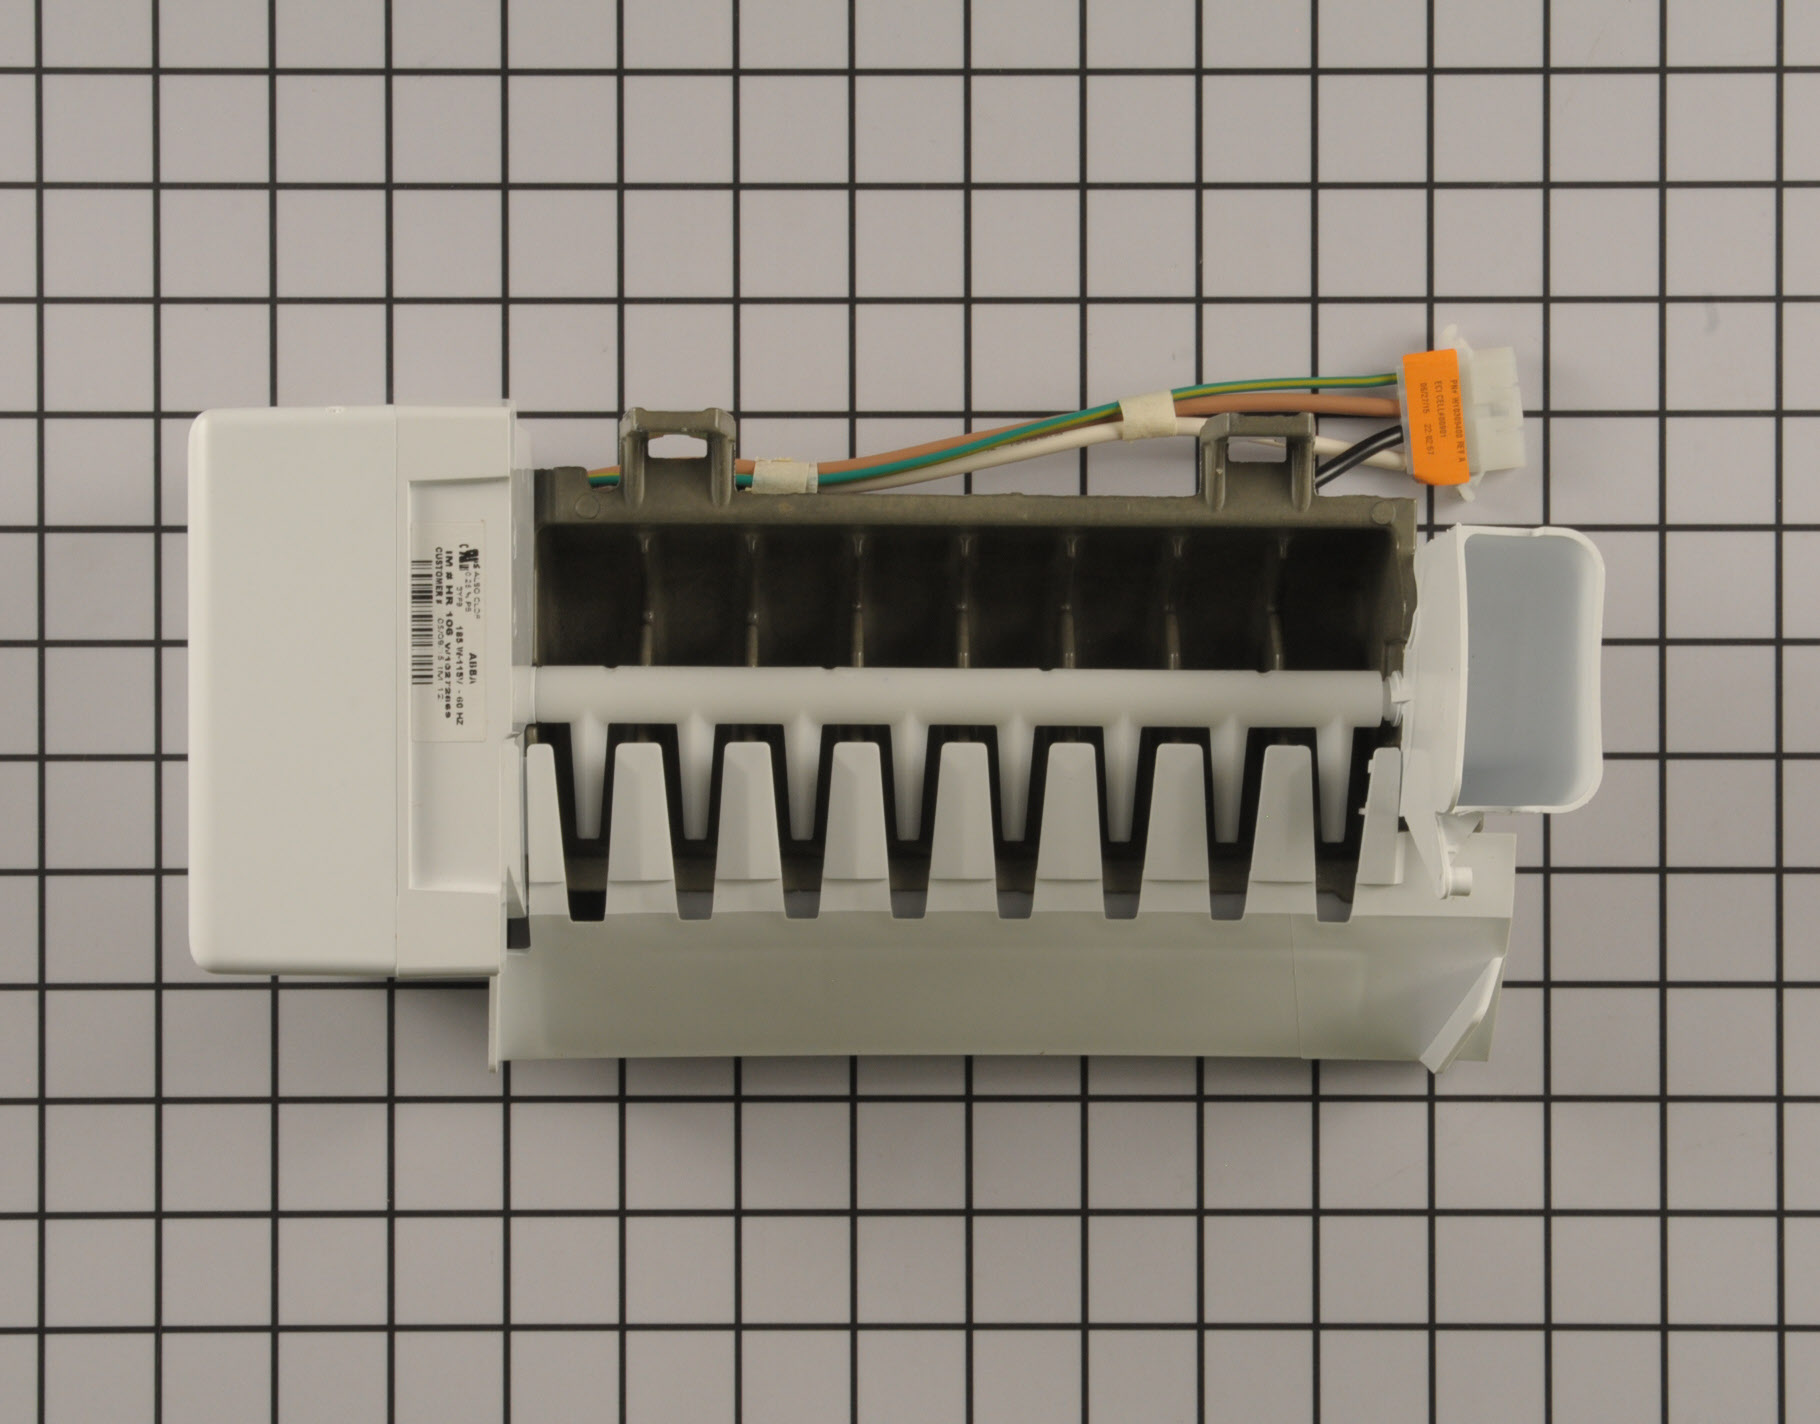 WPW10272869 KitchenAid Refrigerator Part -Ice Maker Assembly